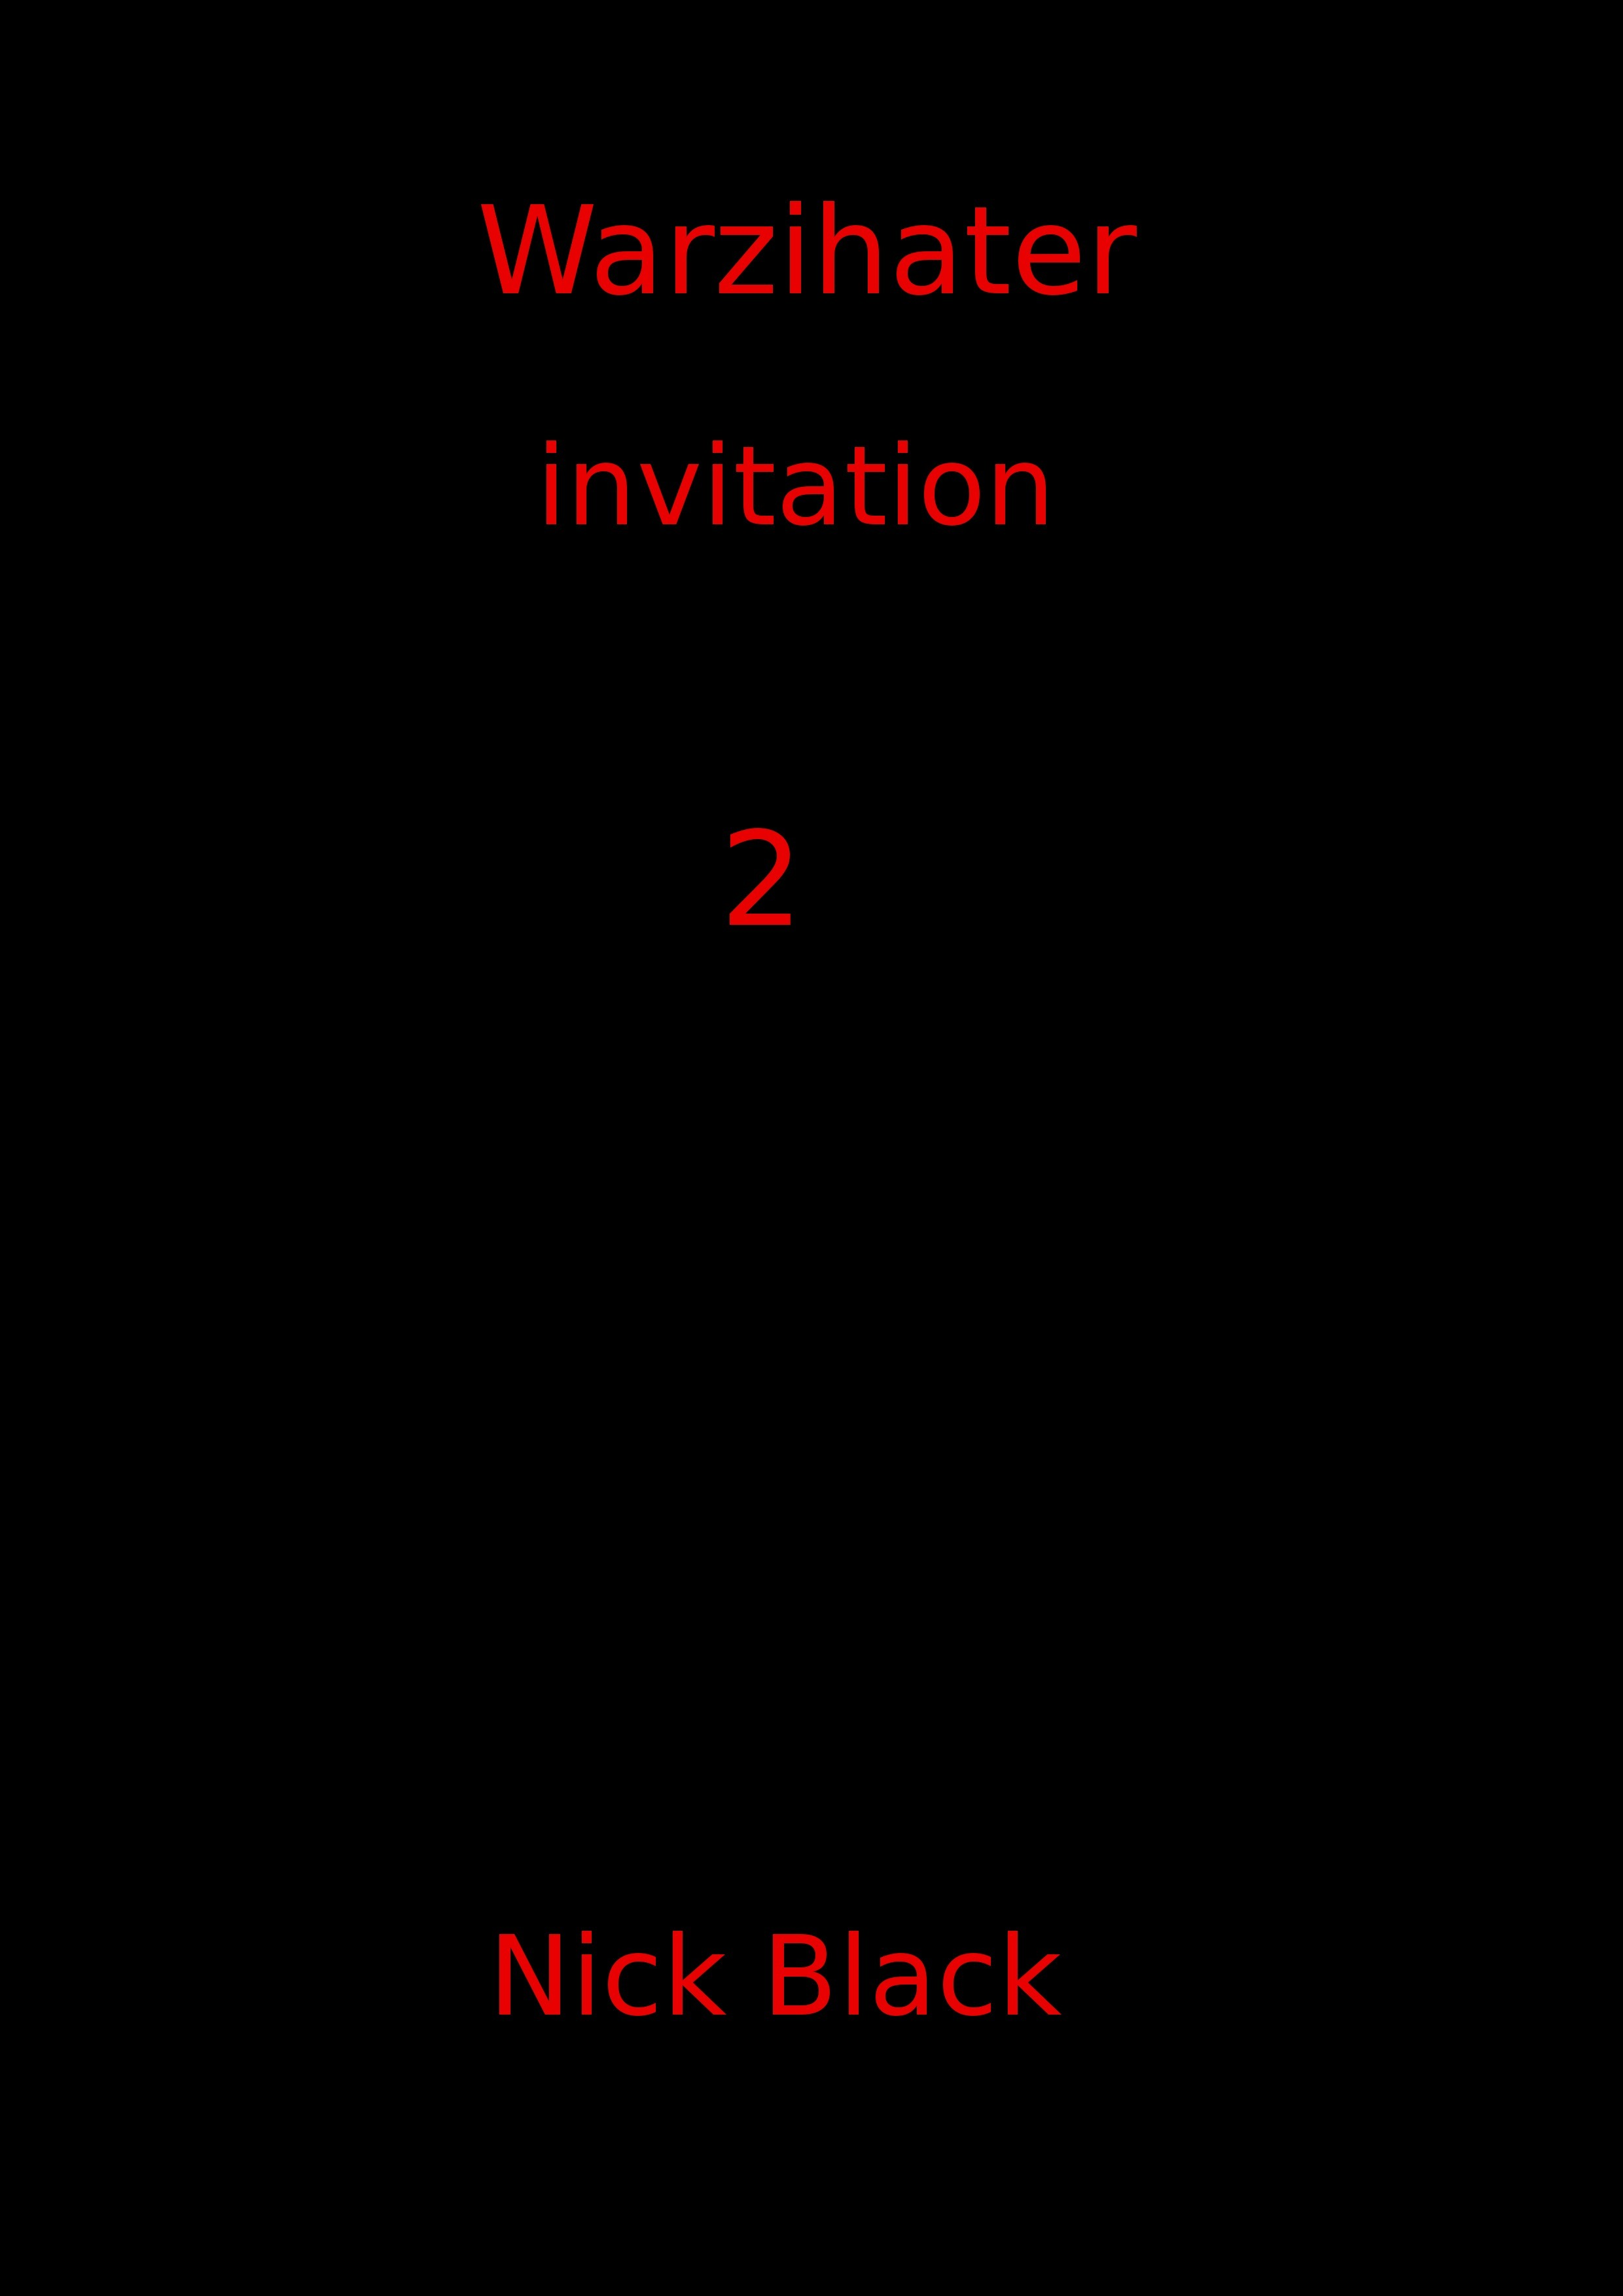 Warzihater: invation 2 NIck Blacks